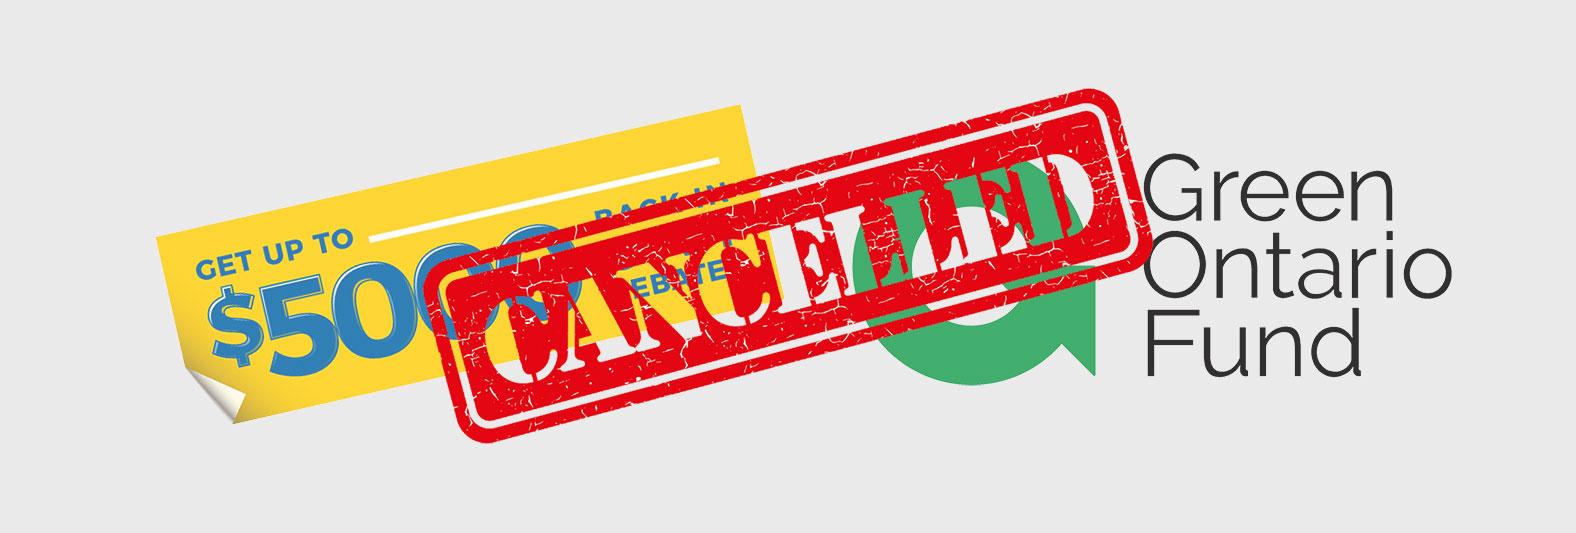 GreenON 5000 rebate program calcelled